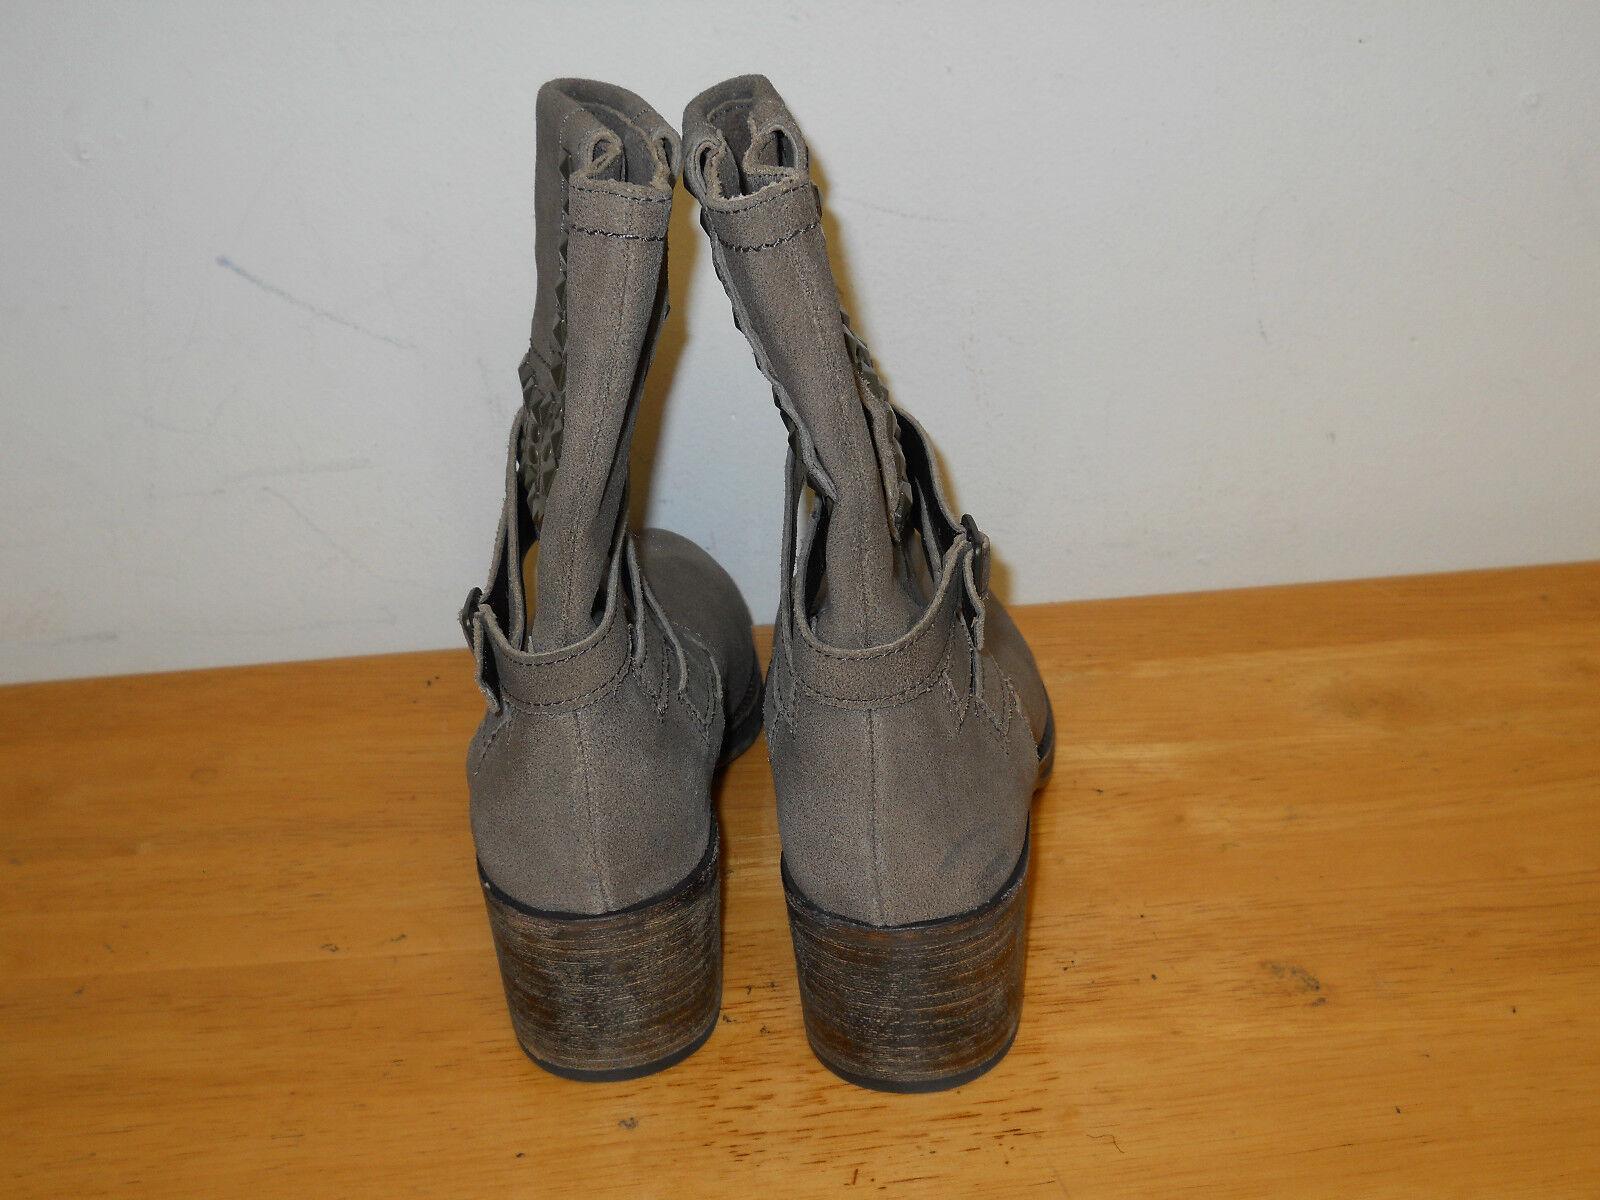 Vince Camuto New Damenschuhe Donato Braun Schuhes Studded Stiefel 5 M Schuhes Braun NWOB a69004